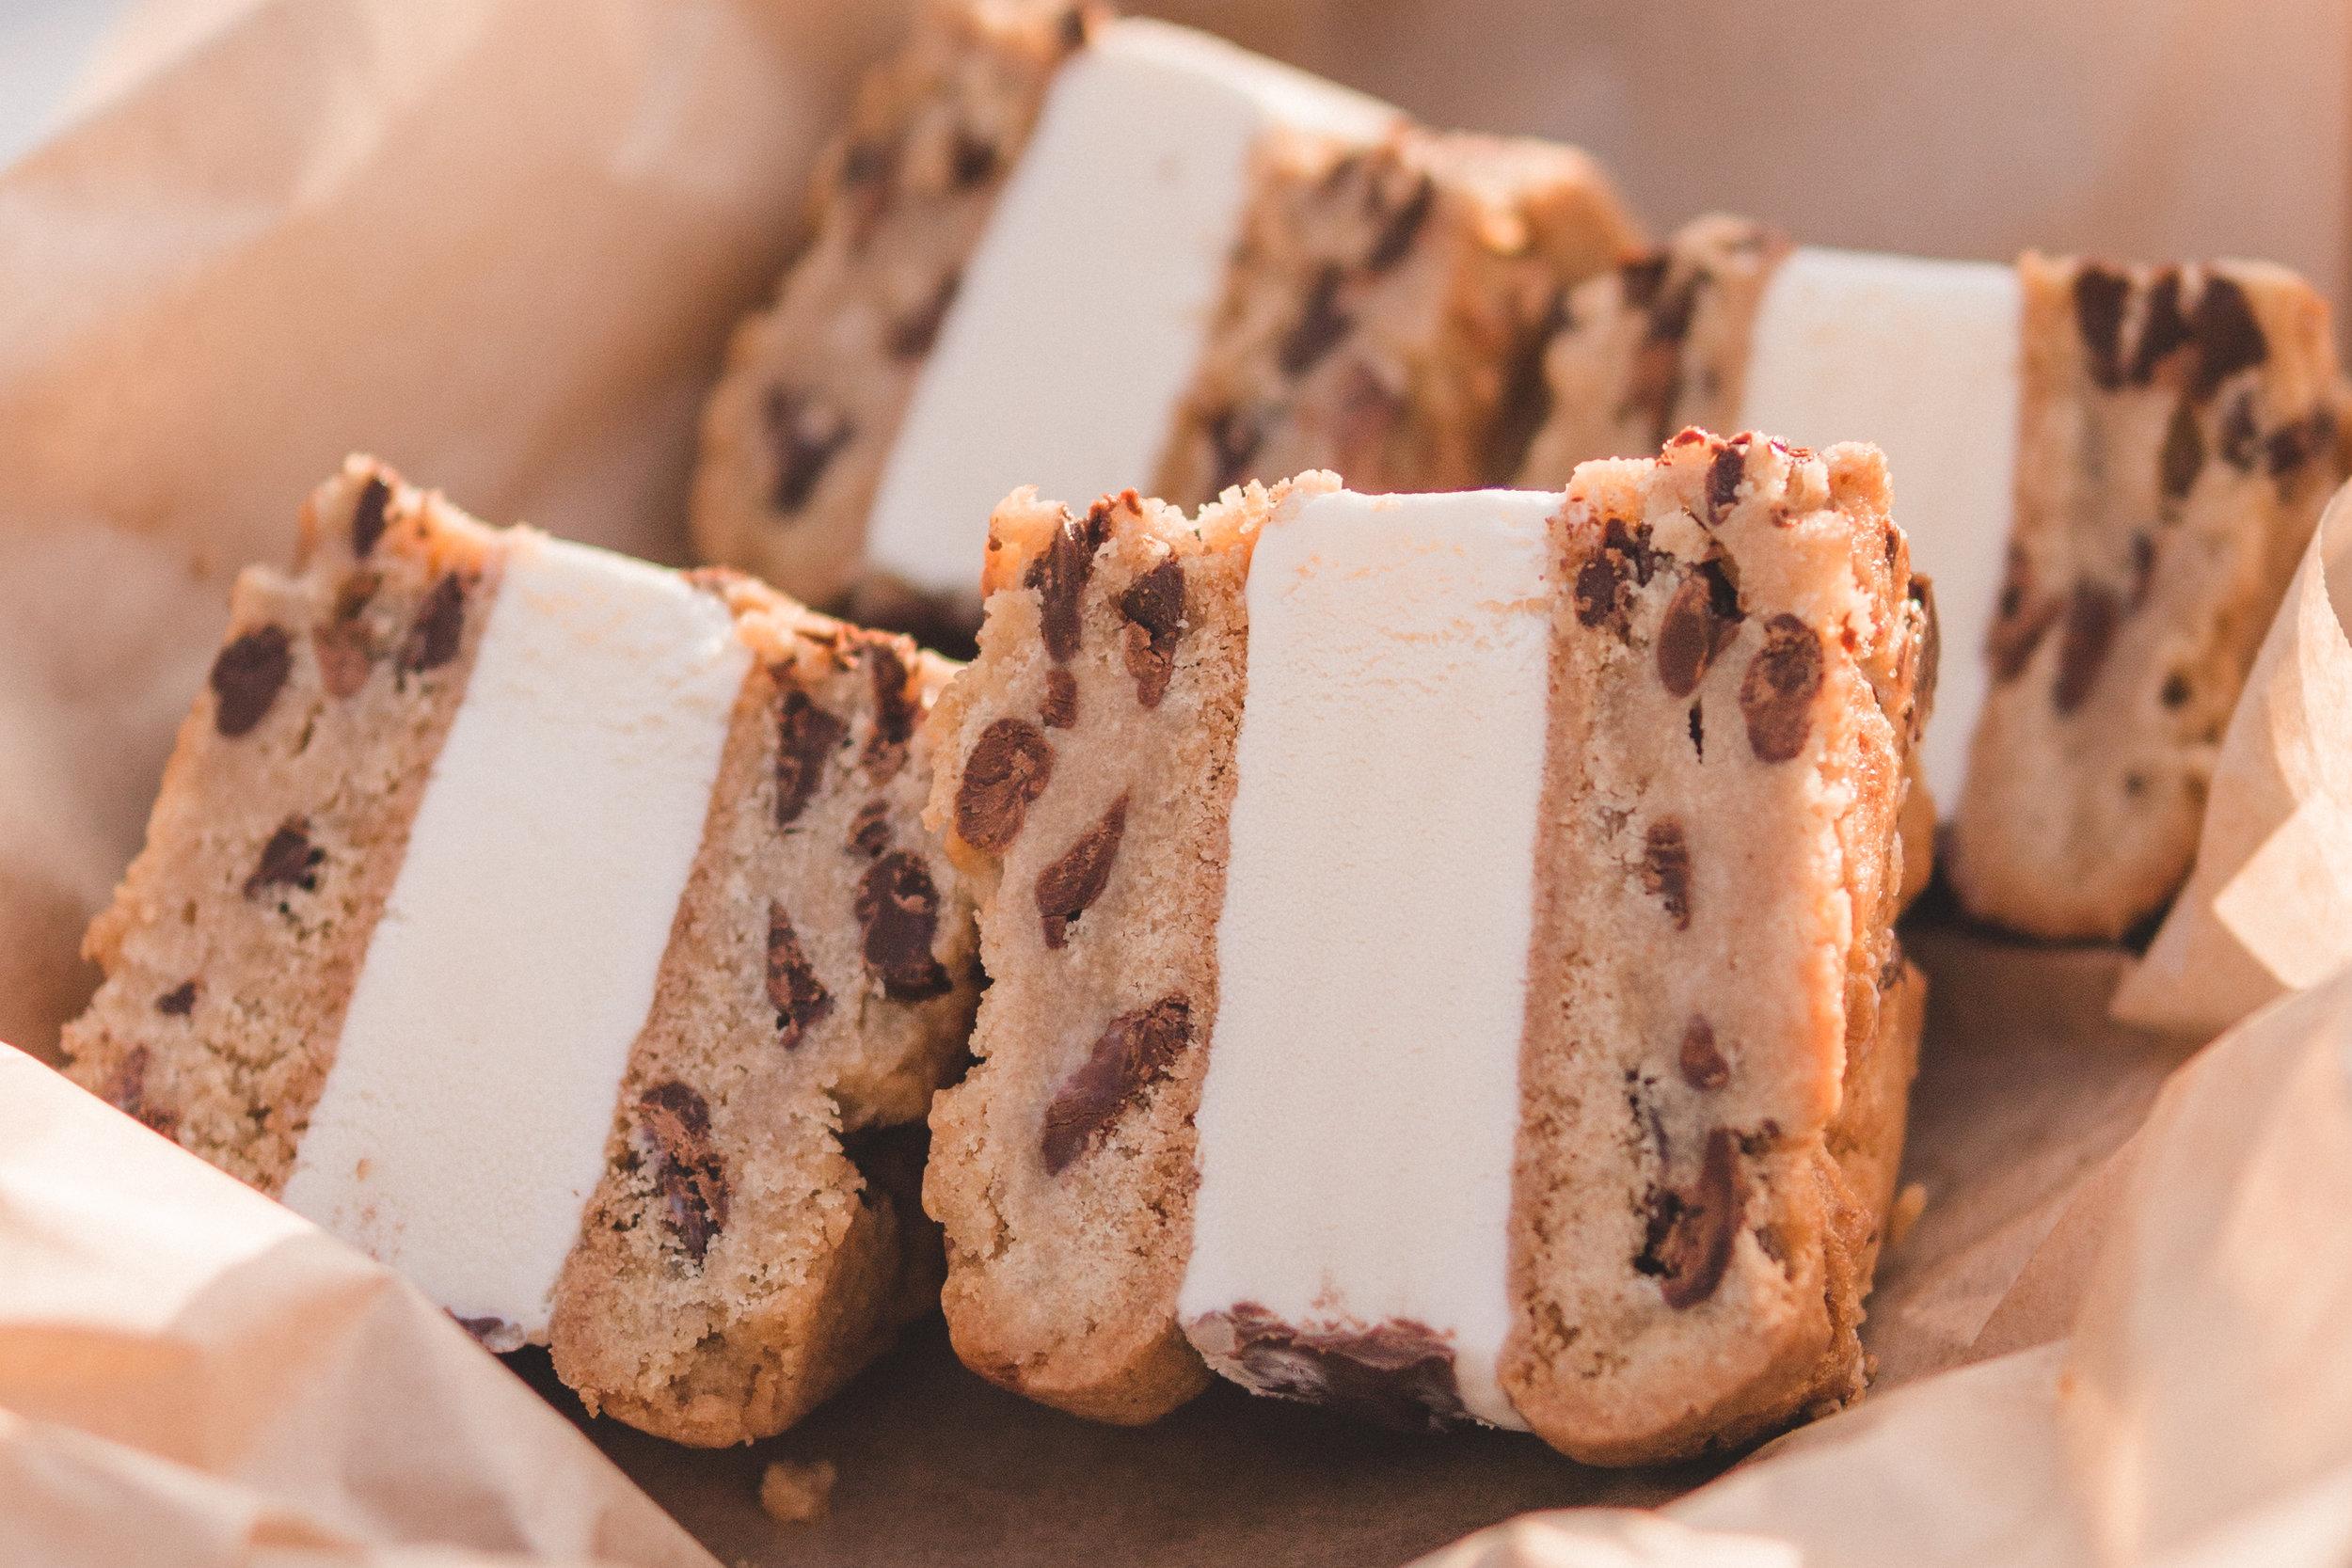 Giant Ice Cream Sandwich: Fresh churned vanilla ice cream, chocolate chip cookies